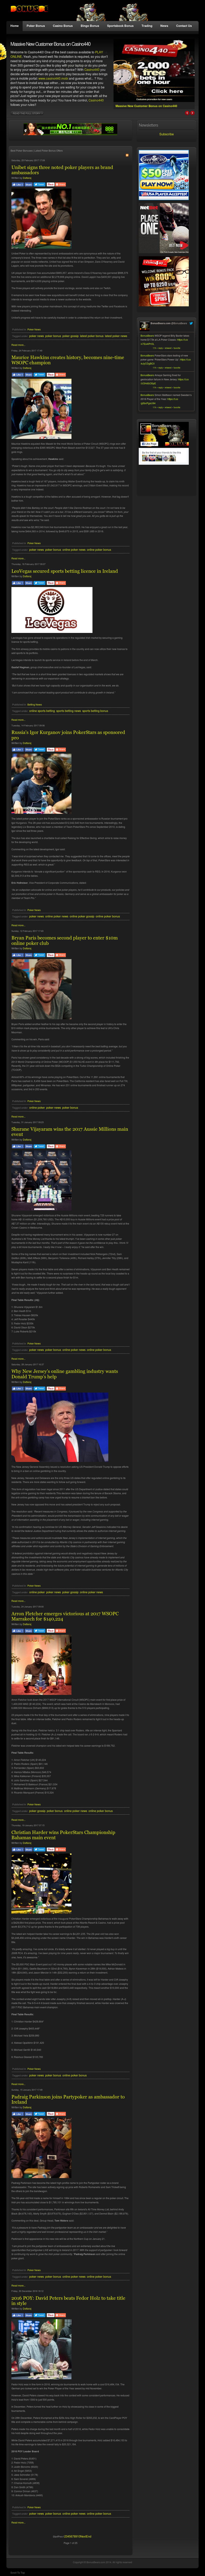 Bonusbears com Online Gaming Portal Competitors, Revenue and